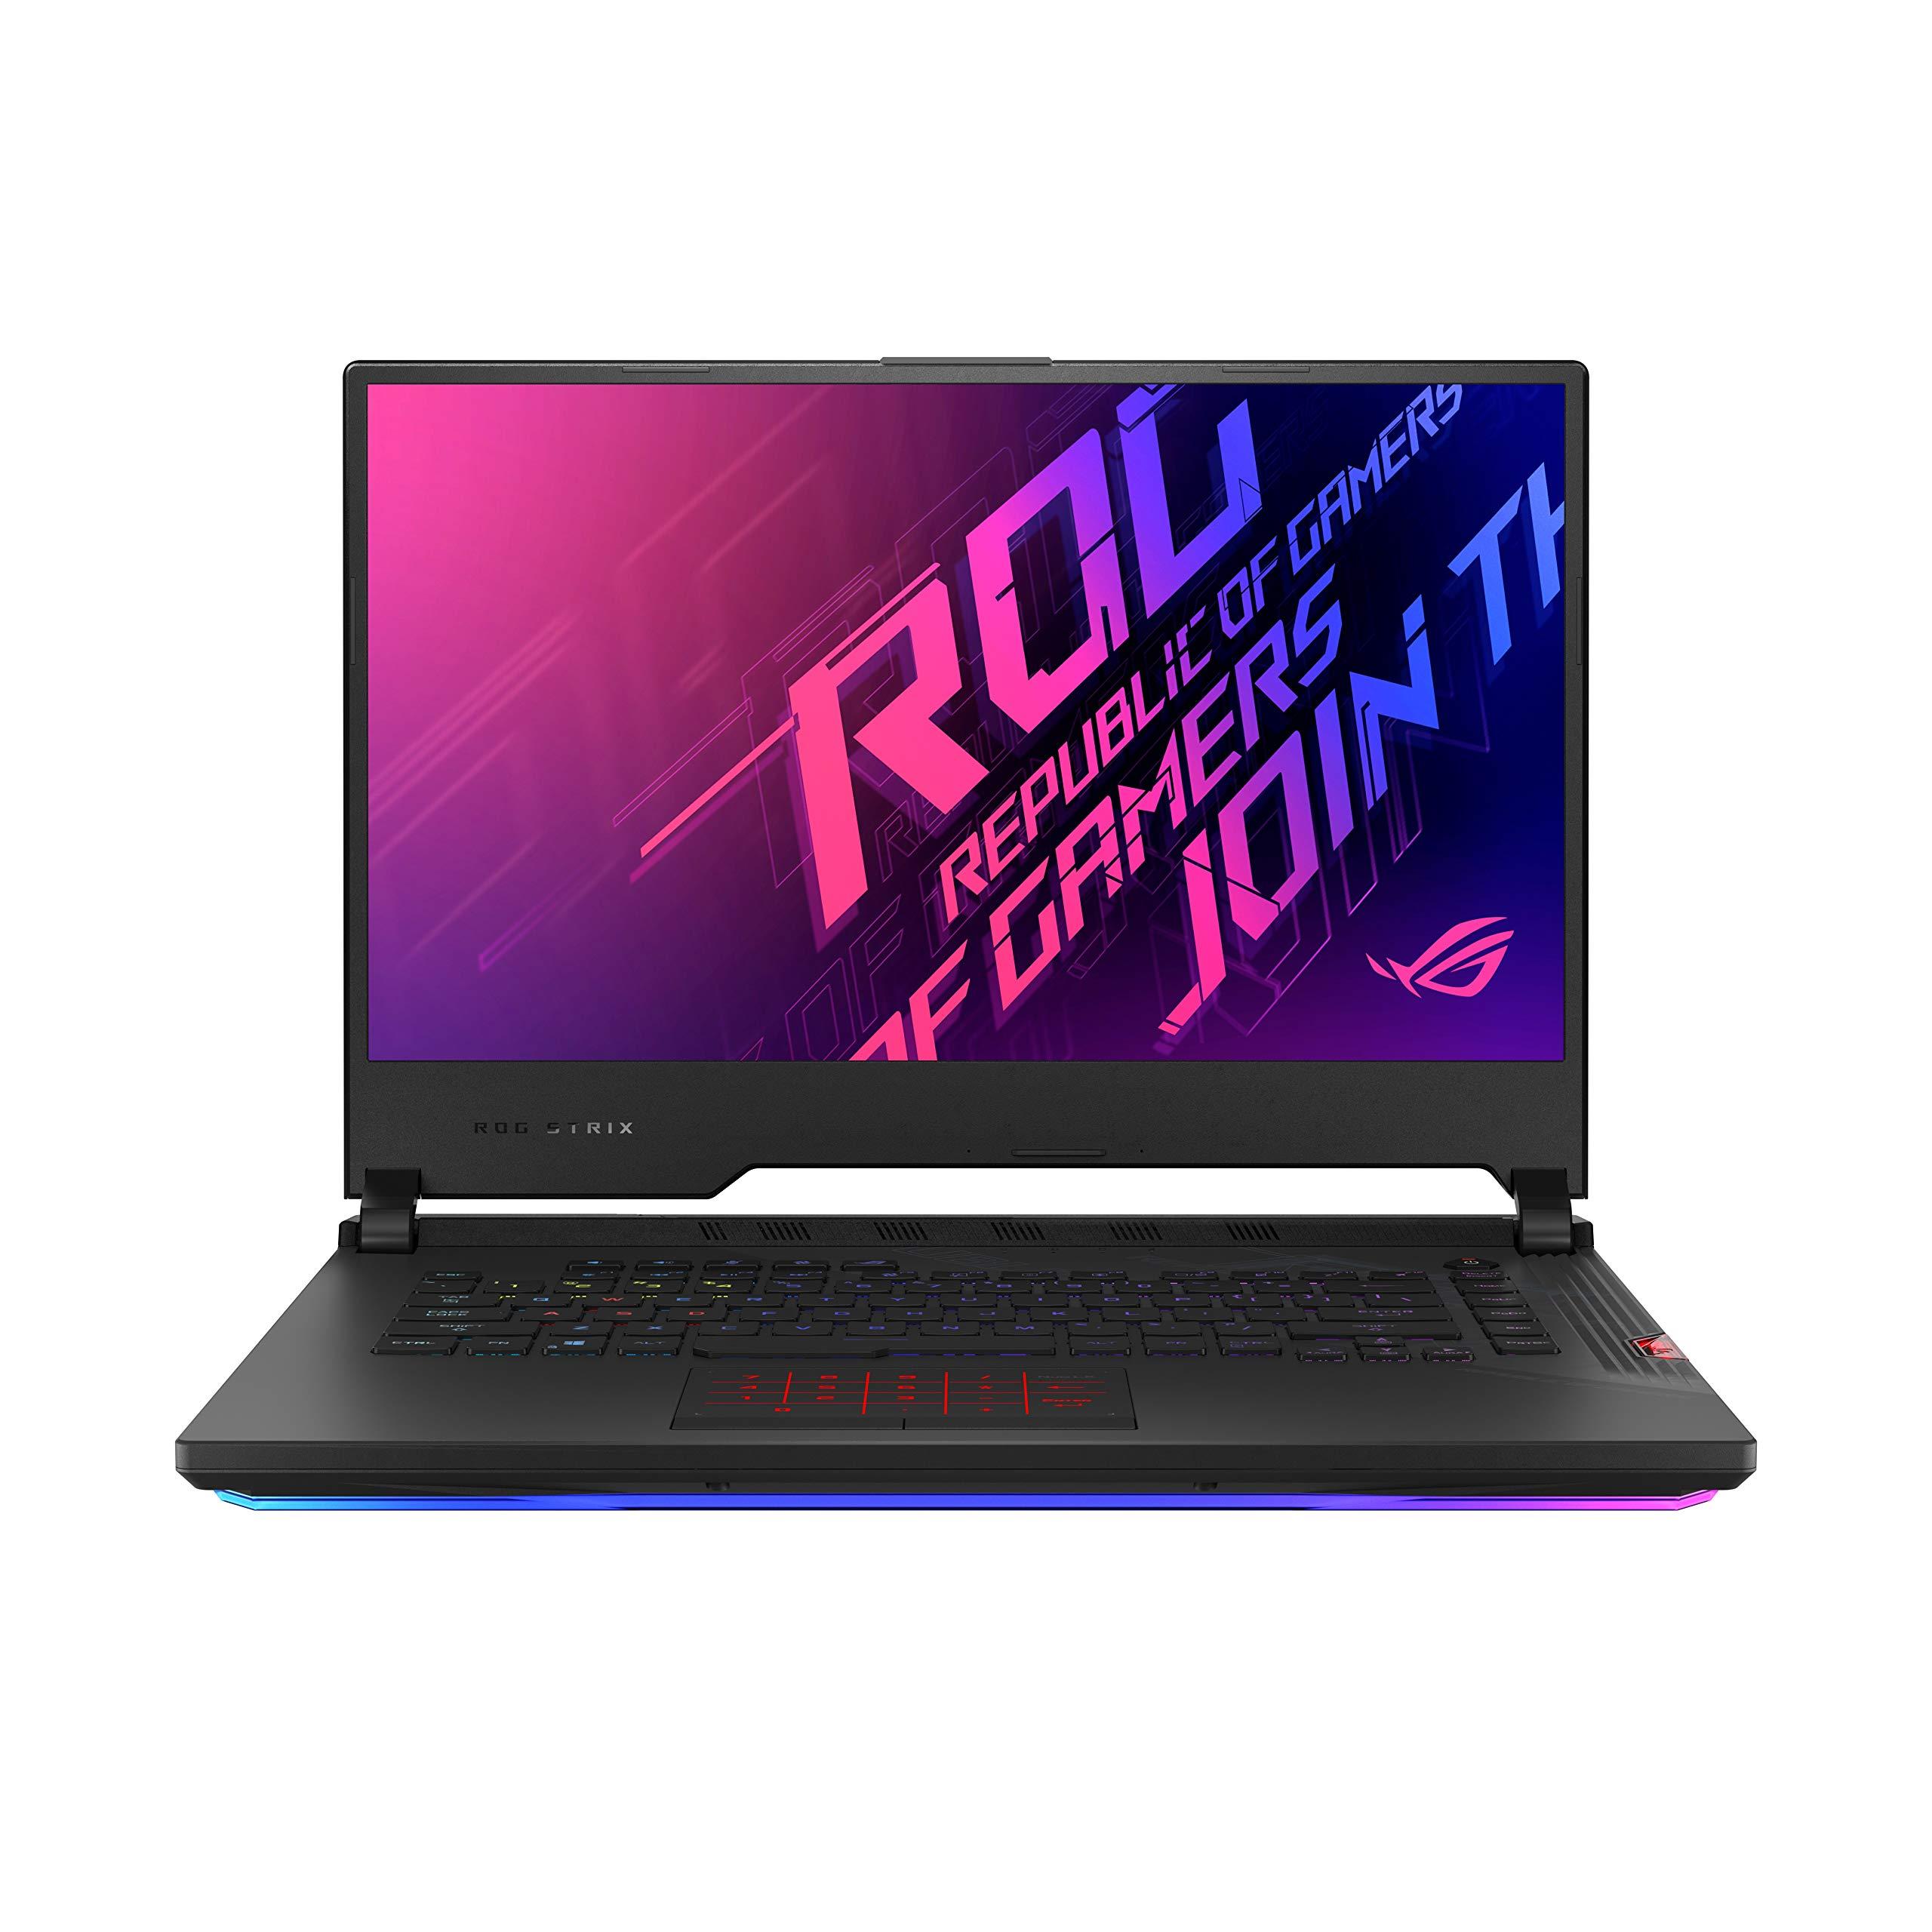 "ASUS ROG StrixScar 15 (2020), 15.6"" FHD 240Hz/3ms, Intel Core i7-10875H 10th Gen, RTX2060 GDDR6 6GB Graphics, Gaming Laptop (16GB/1TB SSD/Windows 10/Per-Key RGB/Black/2.35 Kg), G532LV-AZ046T"